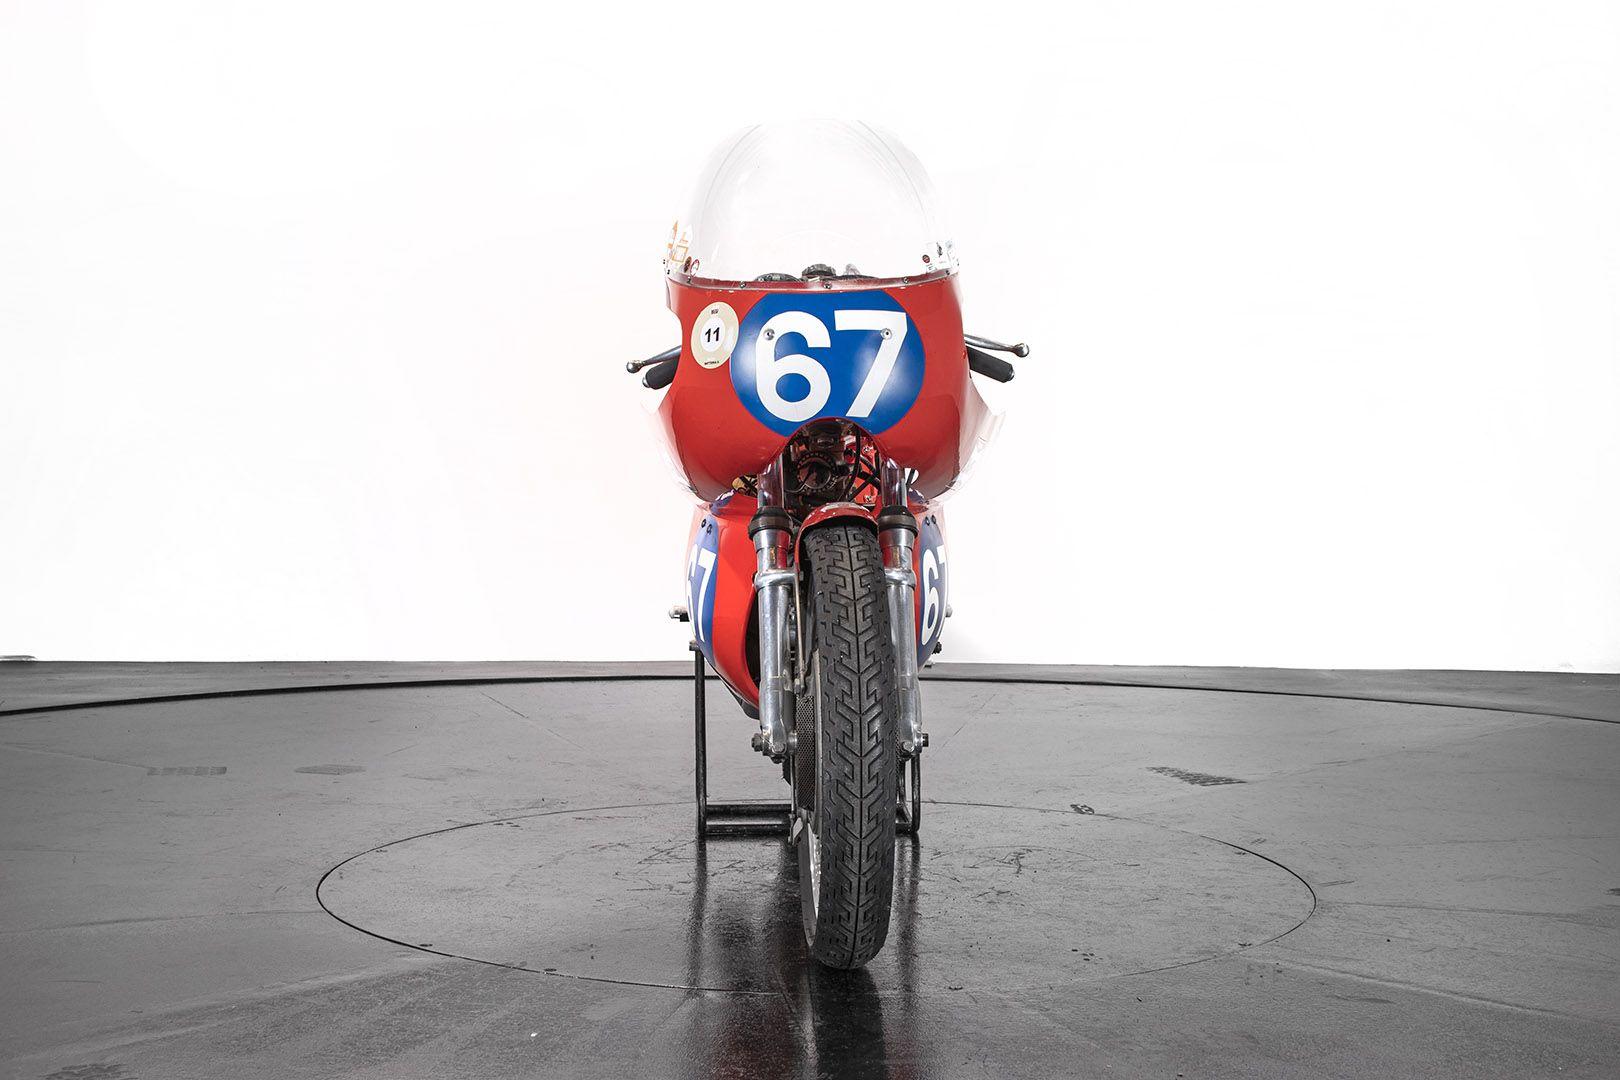 1969 Aermacchi Harley-Davidson 350 Ala d'oro 61116